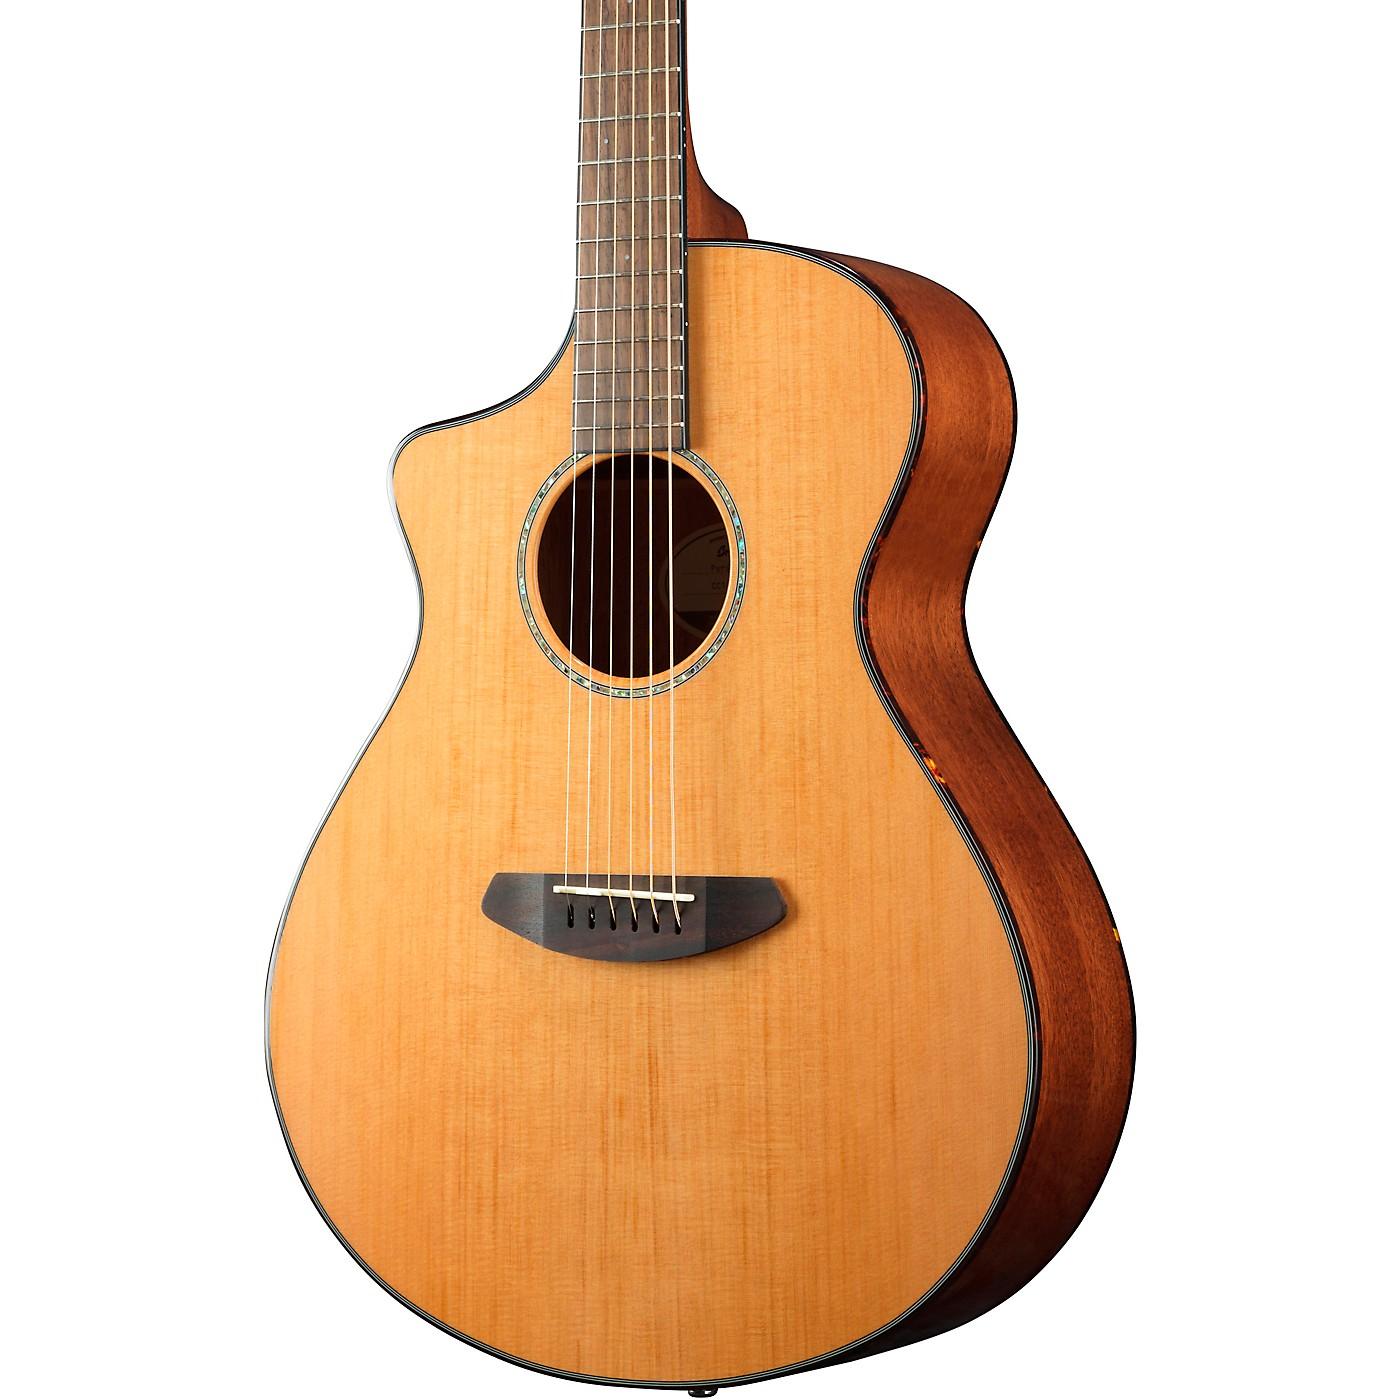 Breedlove Pursuit Left-Handed Concert Cutaway CE Acoustic-Electric Guitar thumbnail